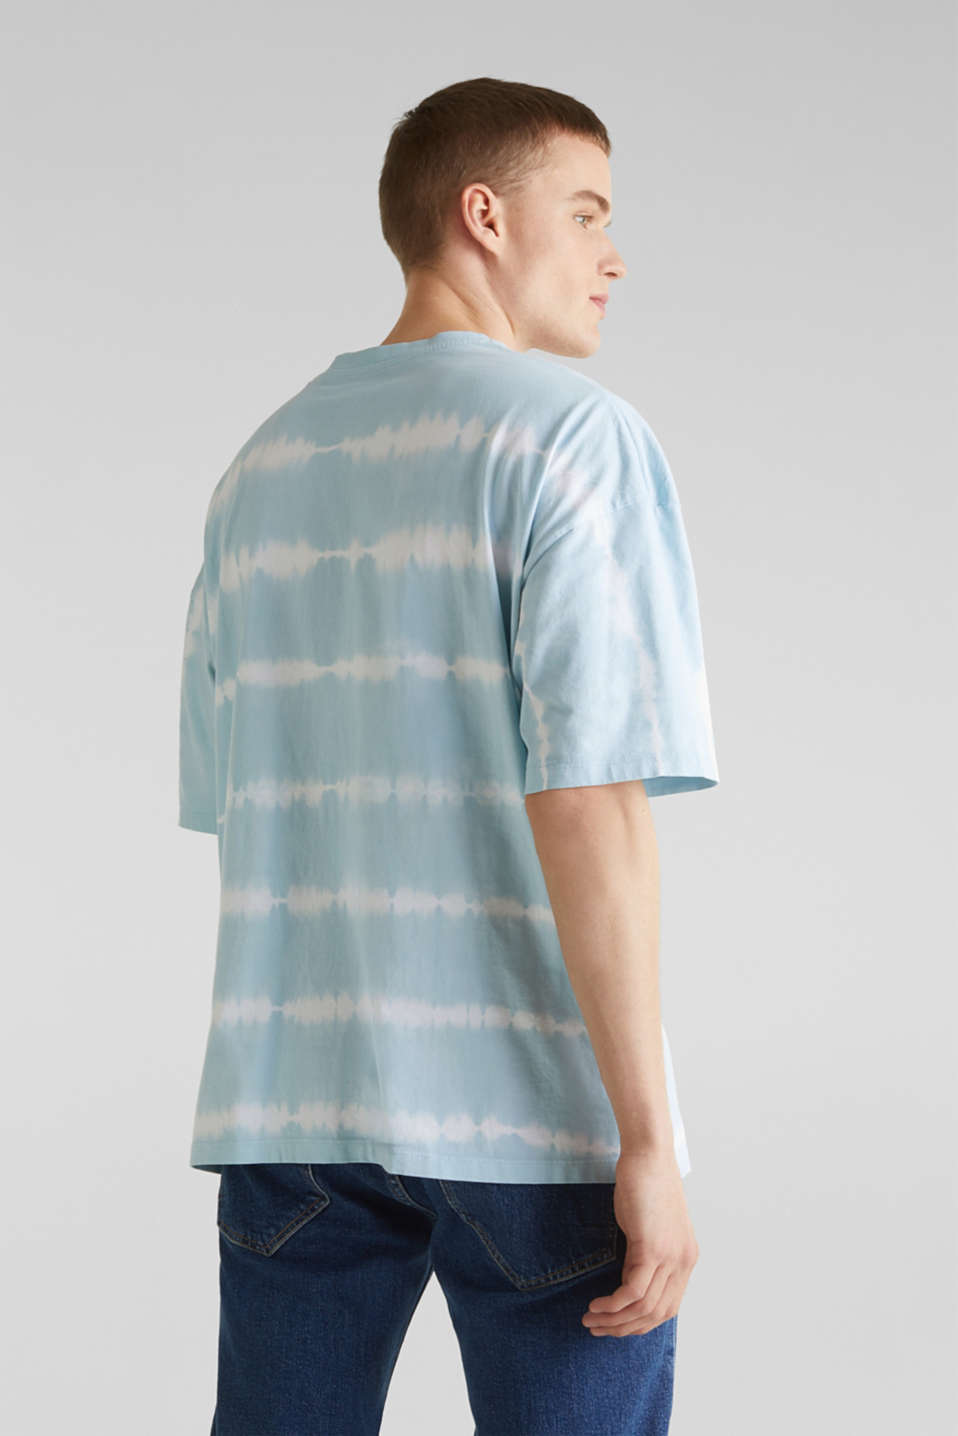 Batik T-shirt with organic cotton, LIGHT BLUE 4, detail image number 3